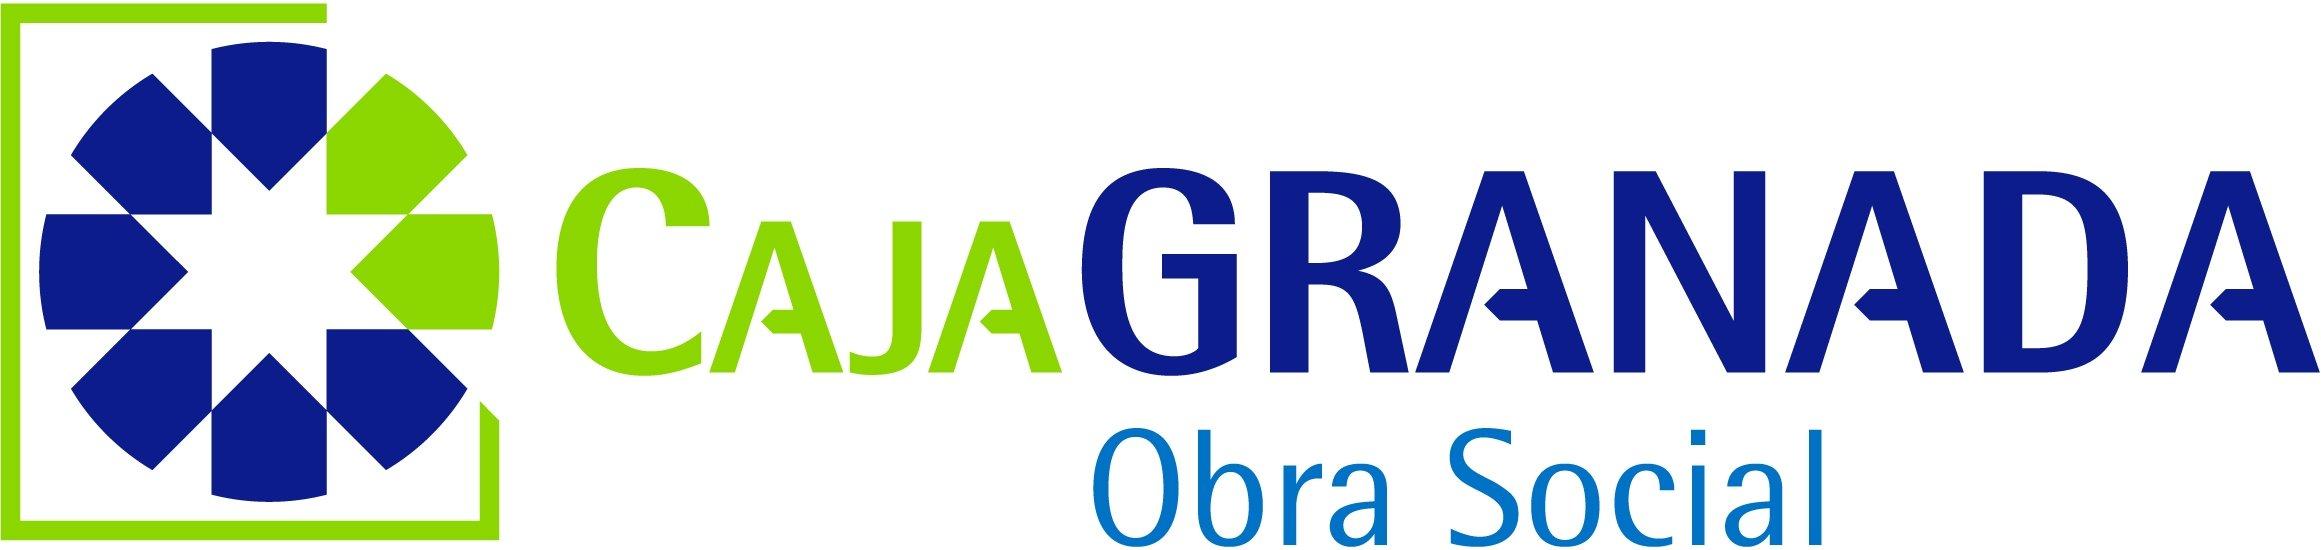 Caja Granada (Banco Mare Nostrum)